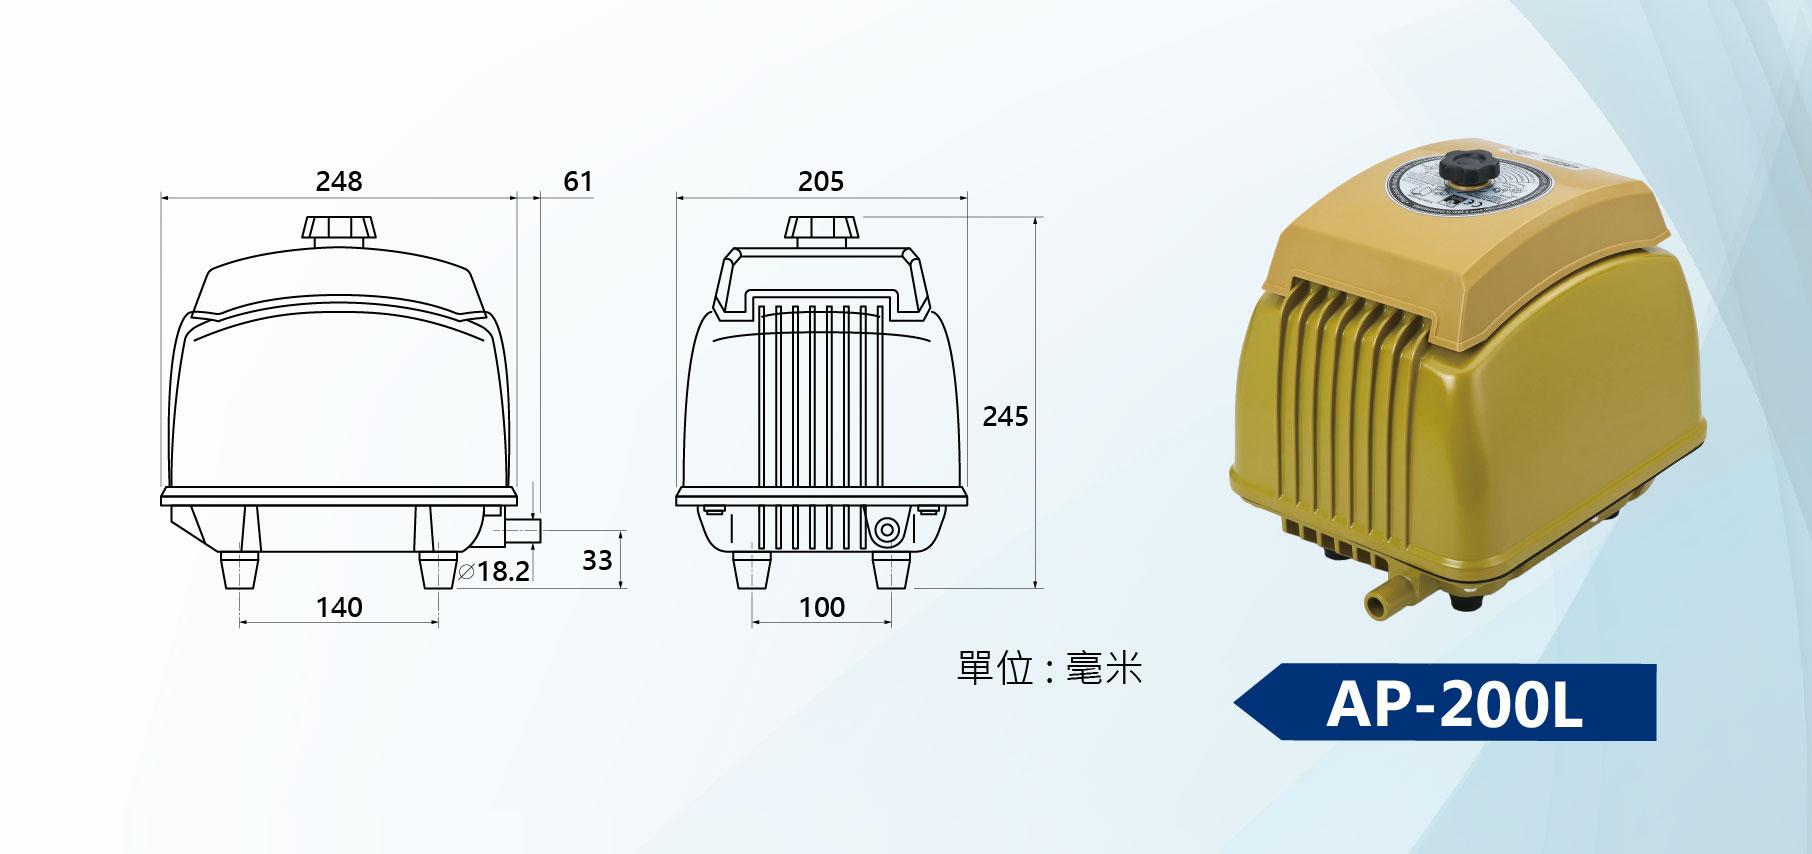 AP-200Lリニアエアーポンプ寸法